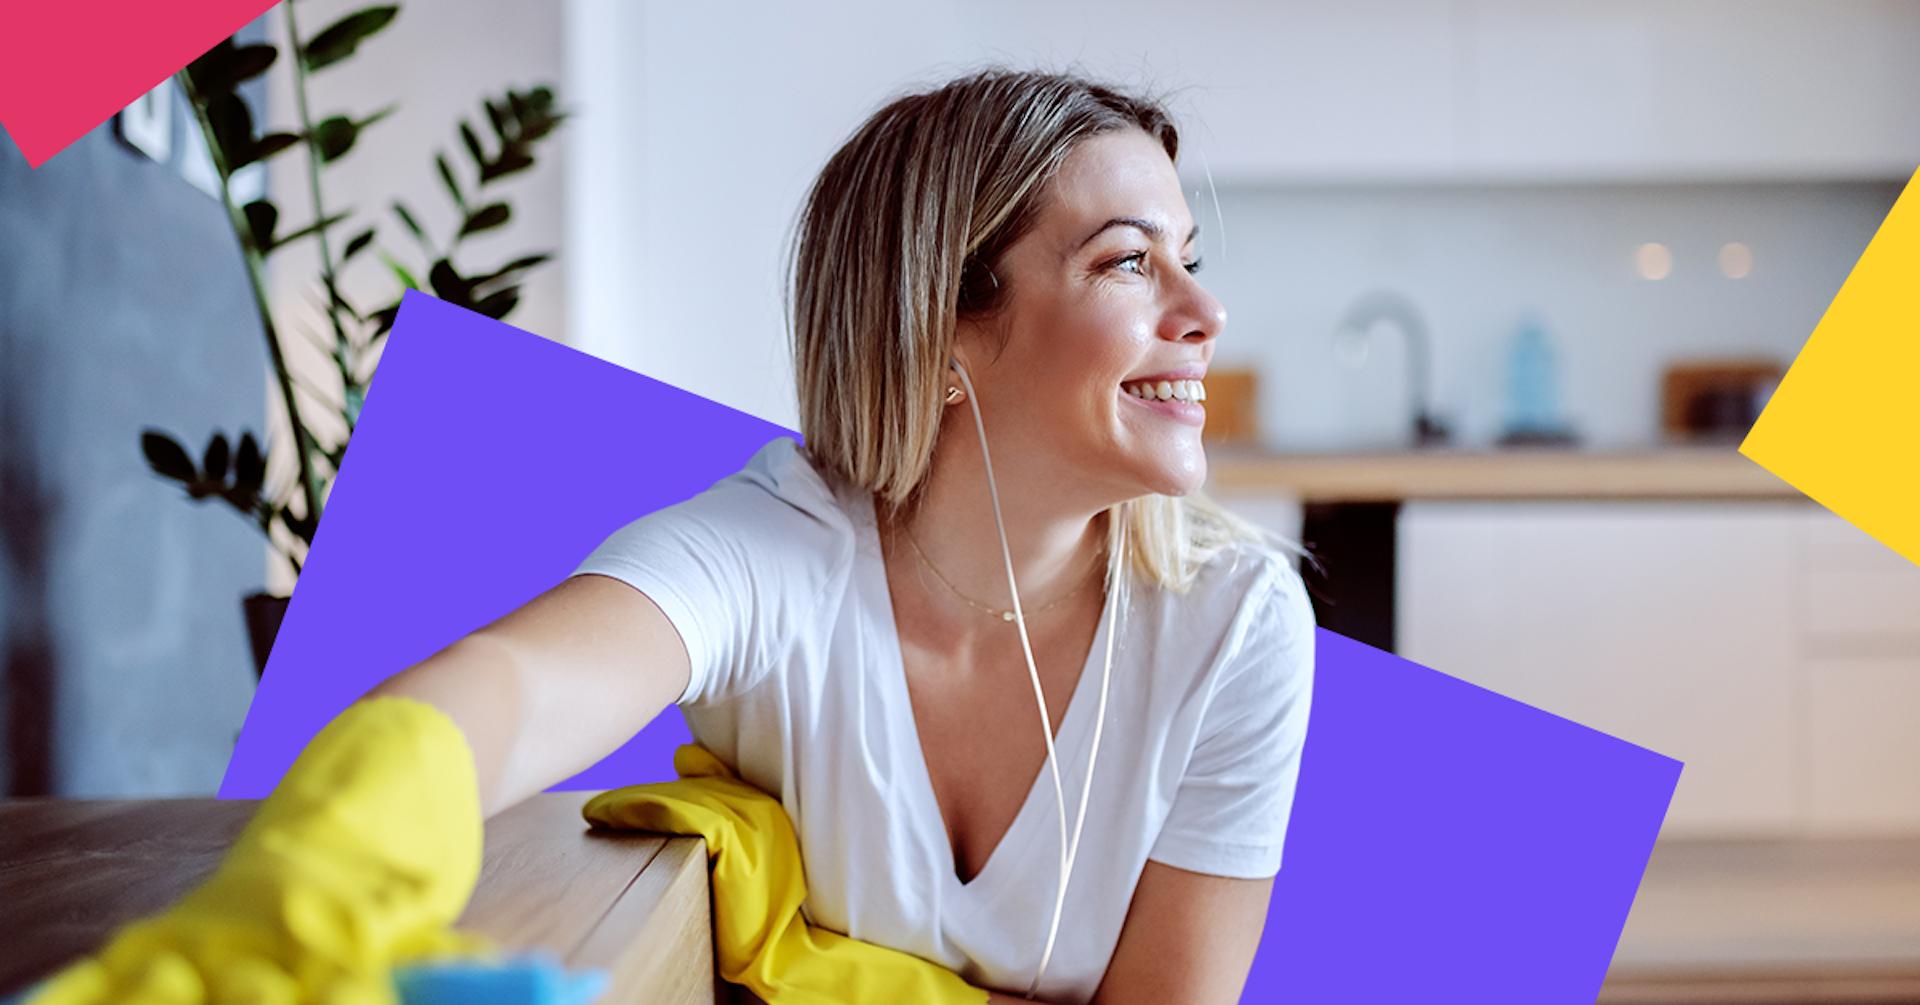 Crehana Podcasts que puedes escuchar mientras limpias tu casa